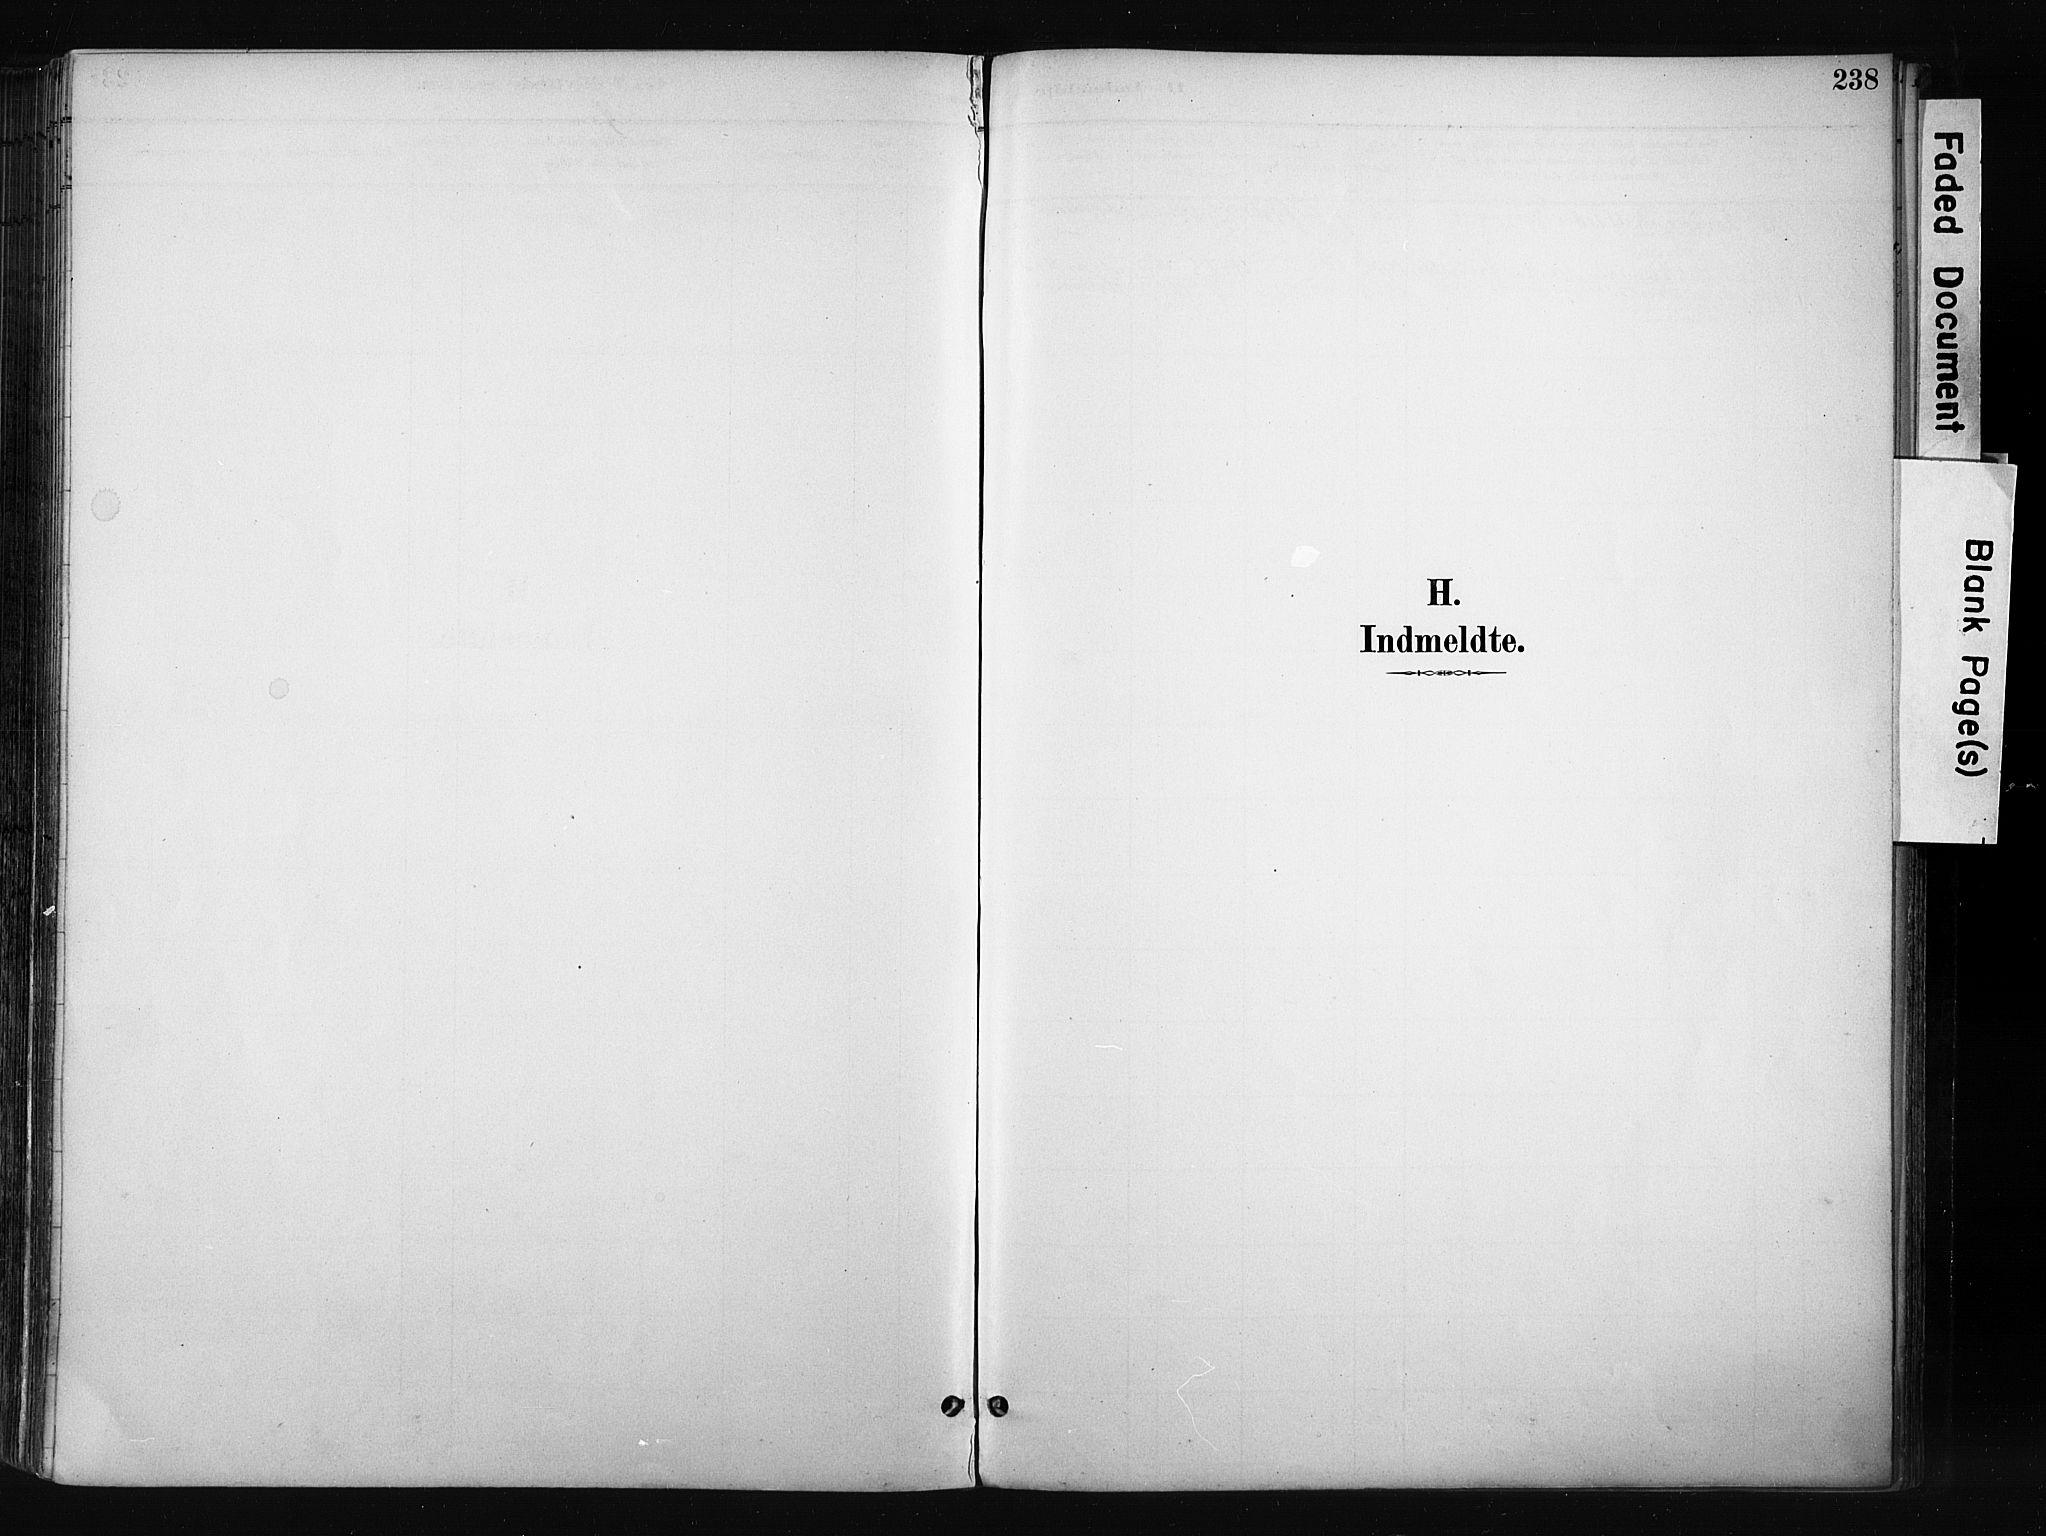 SAH, Gran prestekontor, Ministerialbok nr. 17, 1889-1897, s. 238